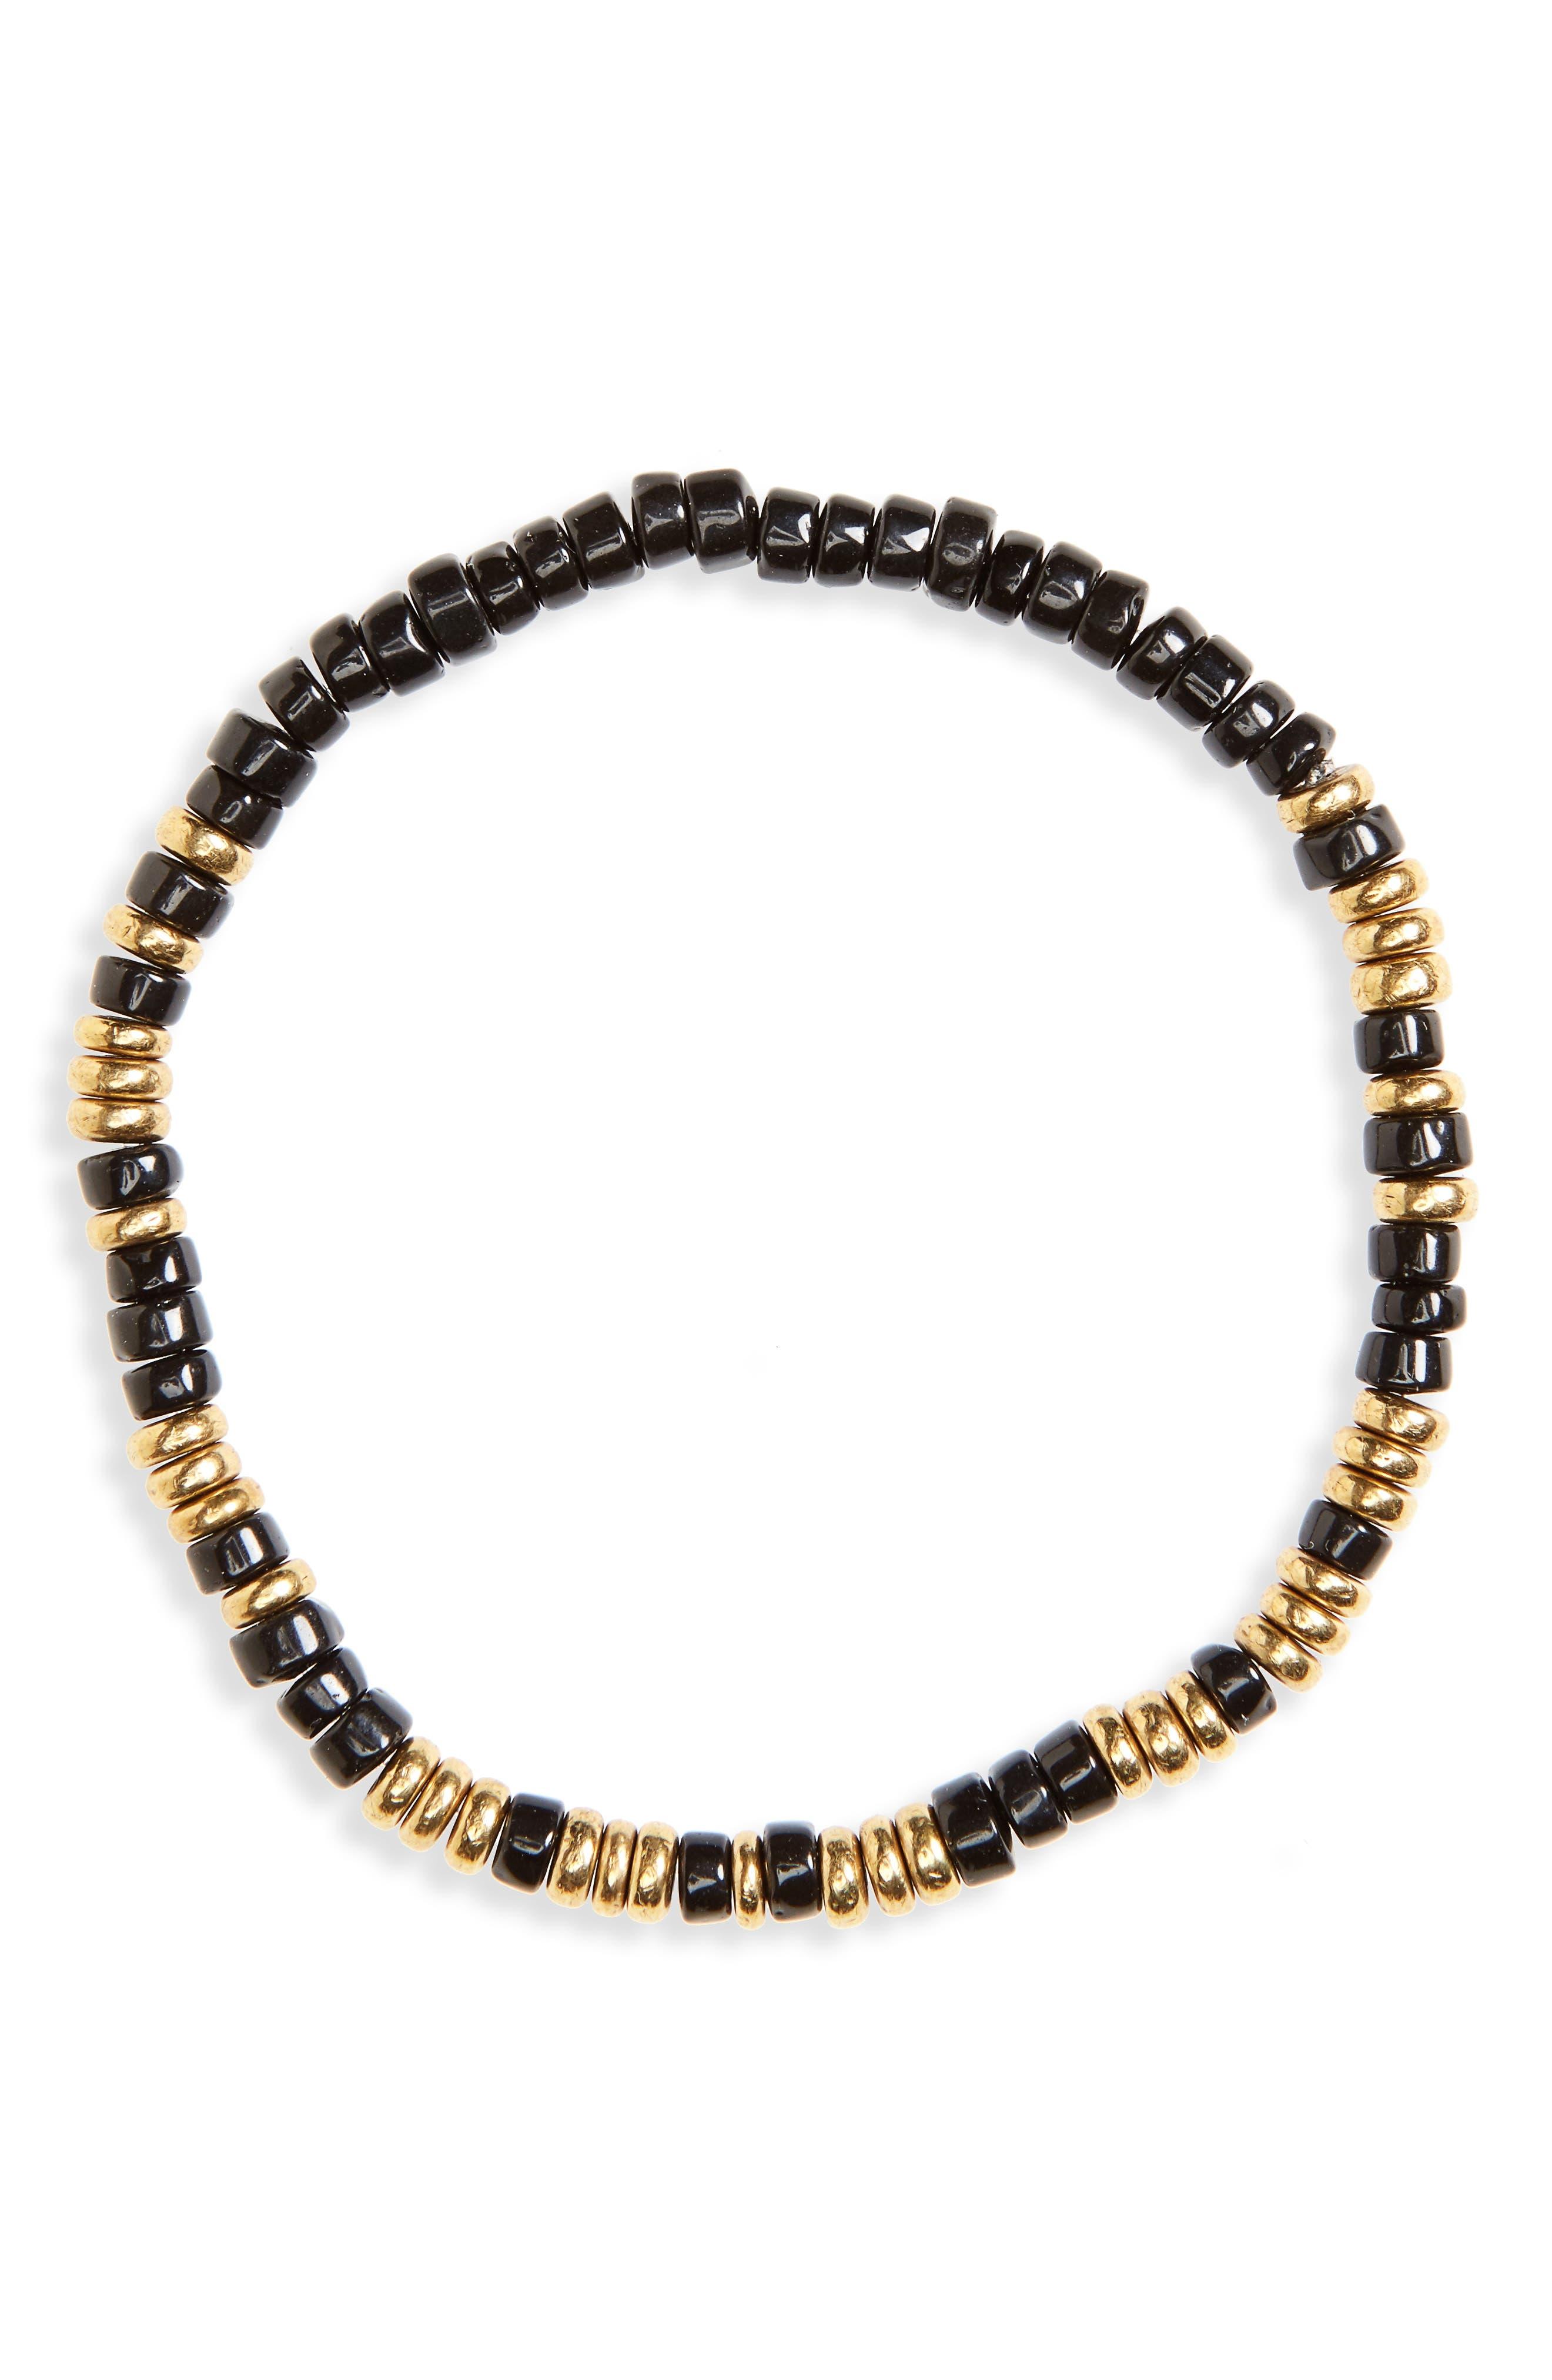 Loyal Morse Beaded Bracelet,                             Main thumbnail 1, color,                             Antique Gold/ Black